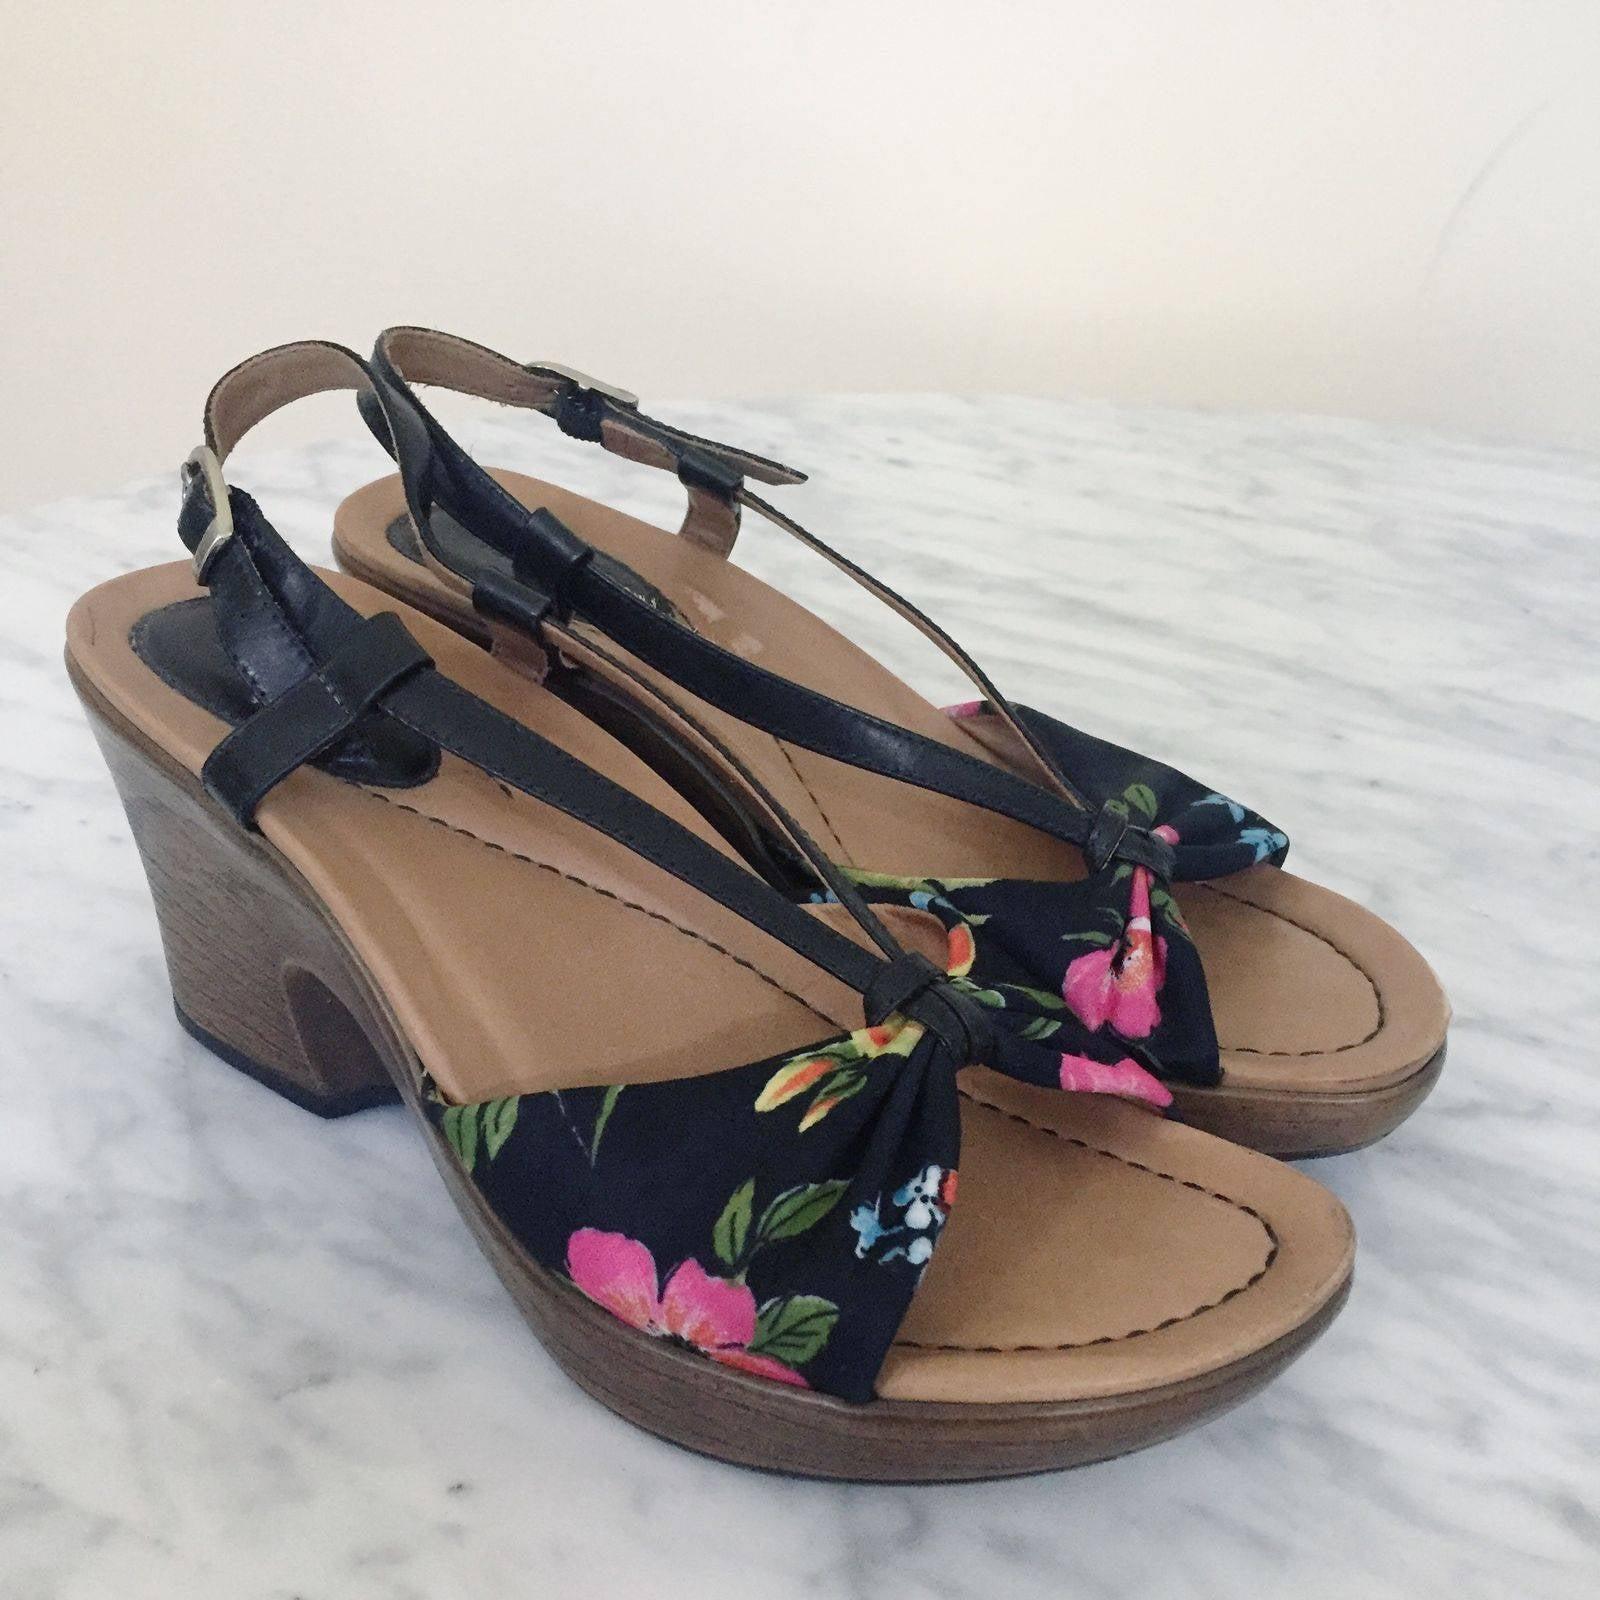 Dansko Black Floral Naomi Wedges Sandal